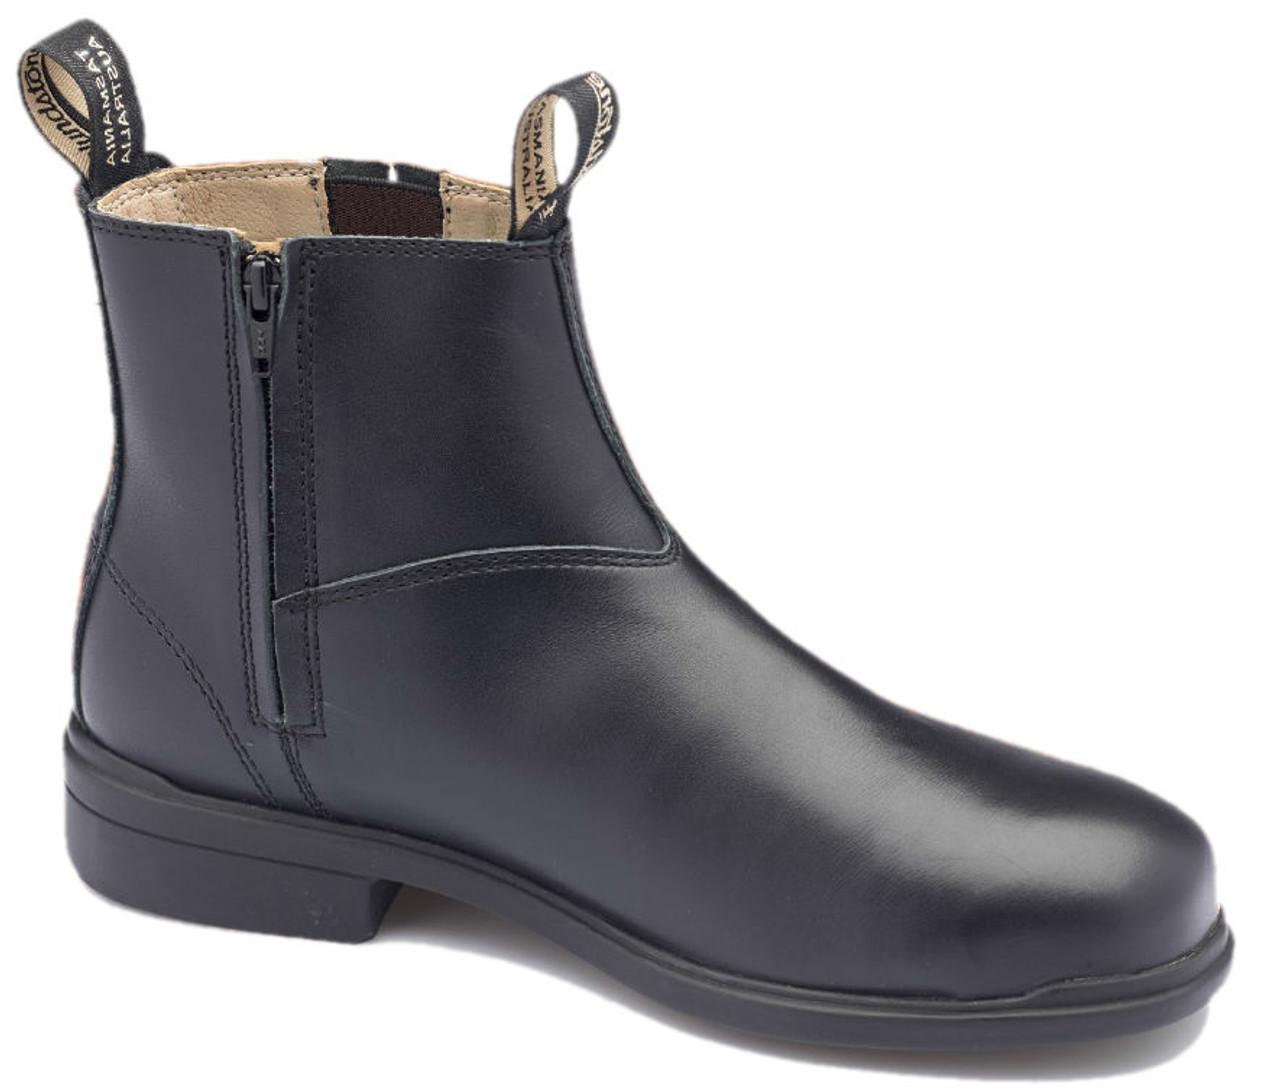 Blundstone 783 Black Full Grain Leather